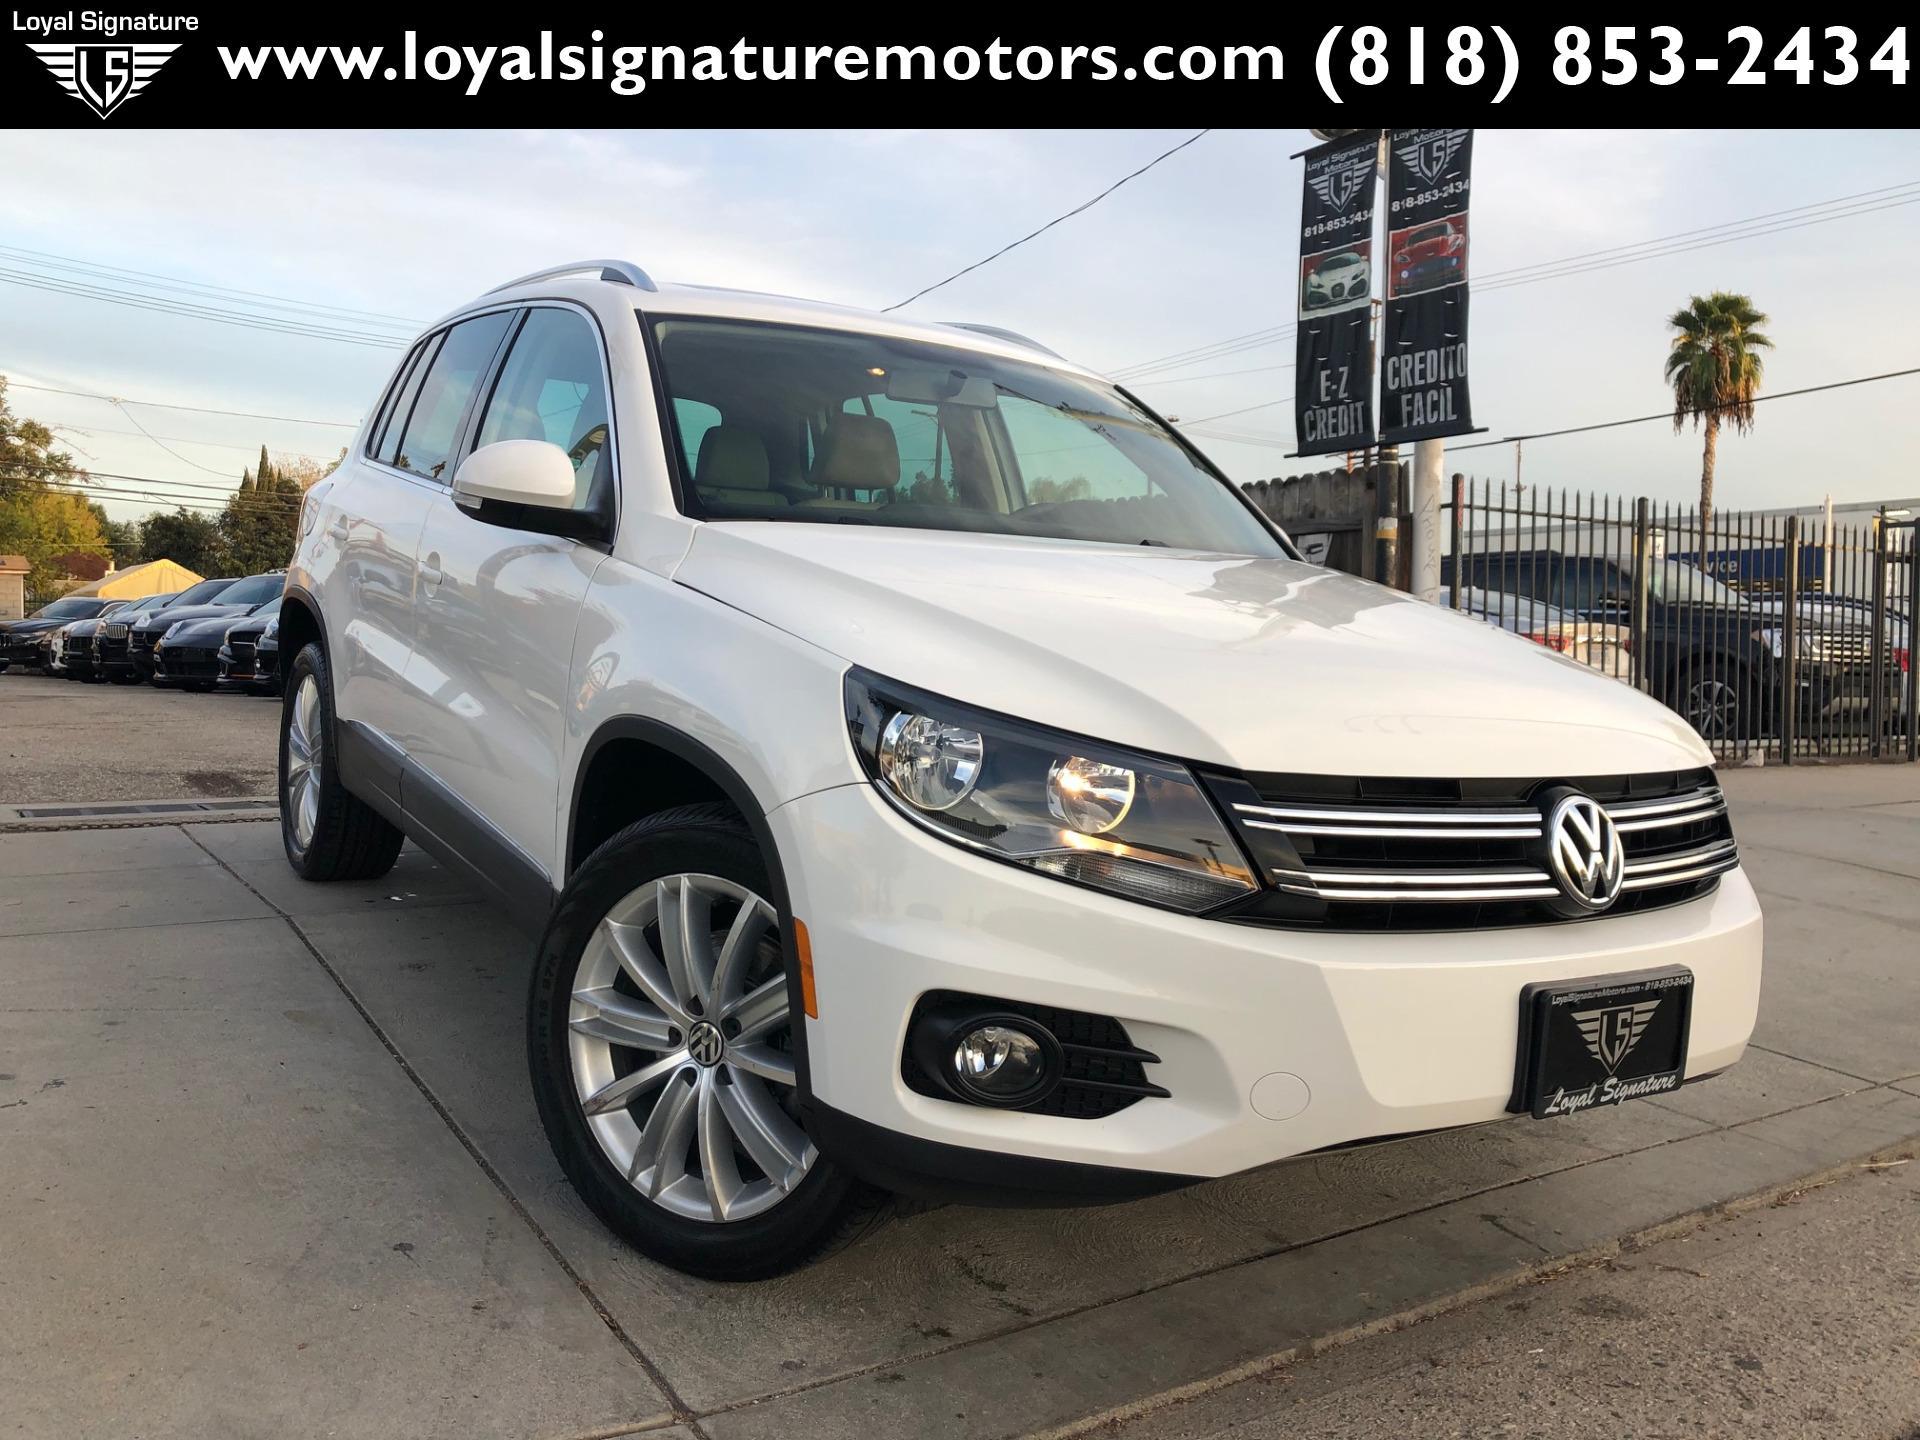 Used 2013 Volkswagen Tiguan SEL | Van Nuys, CA